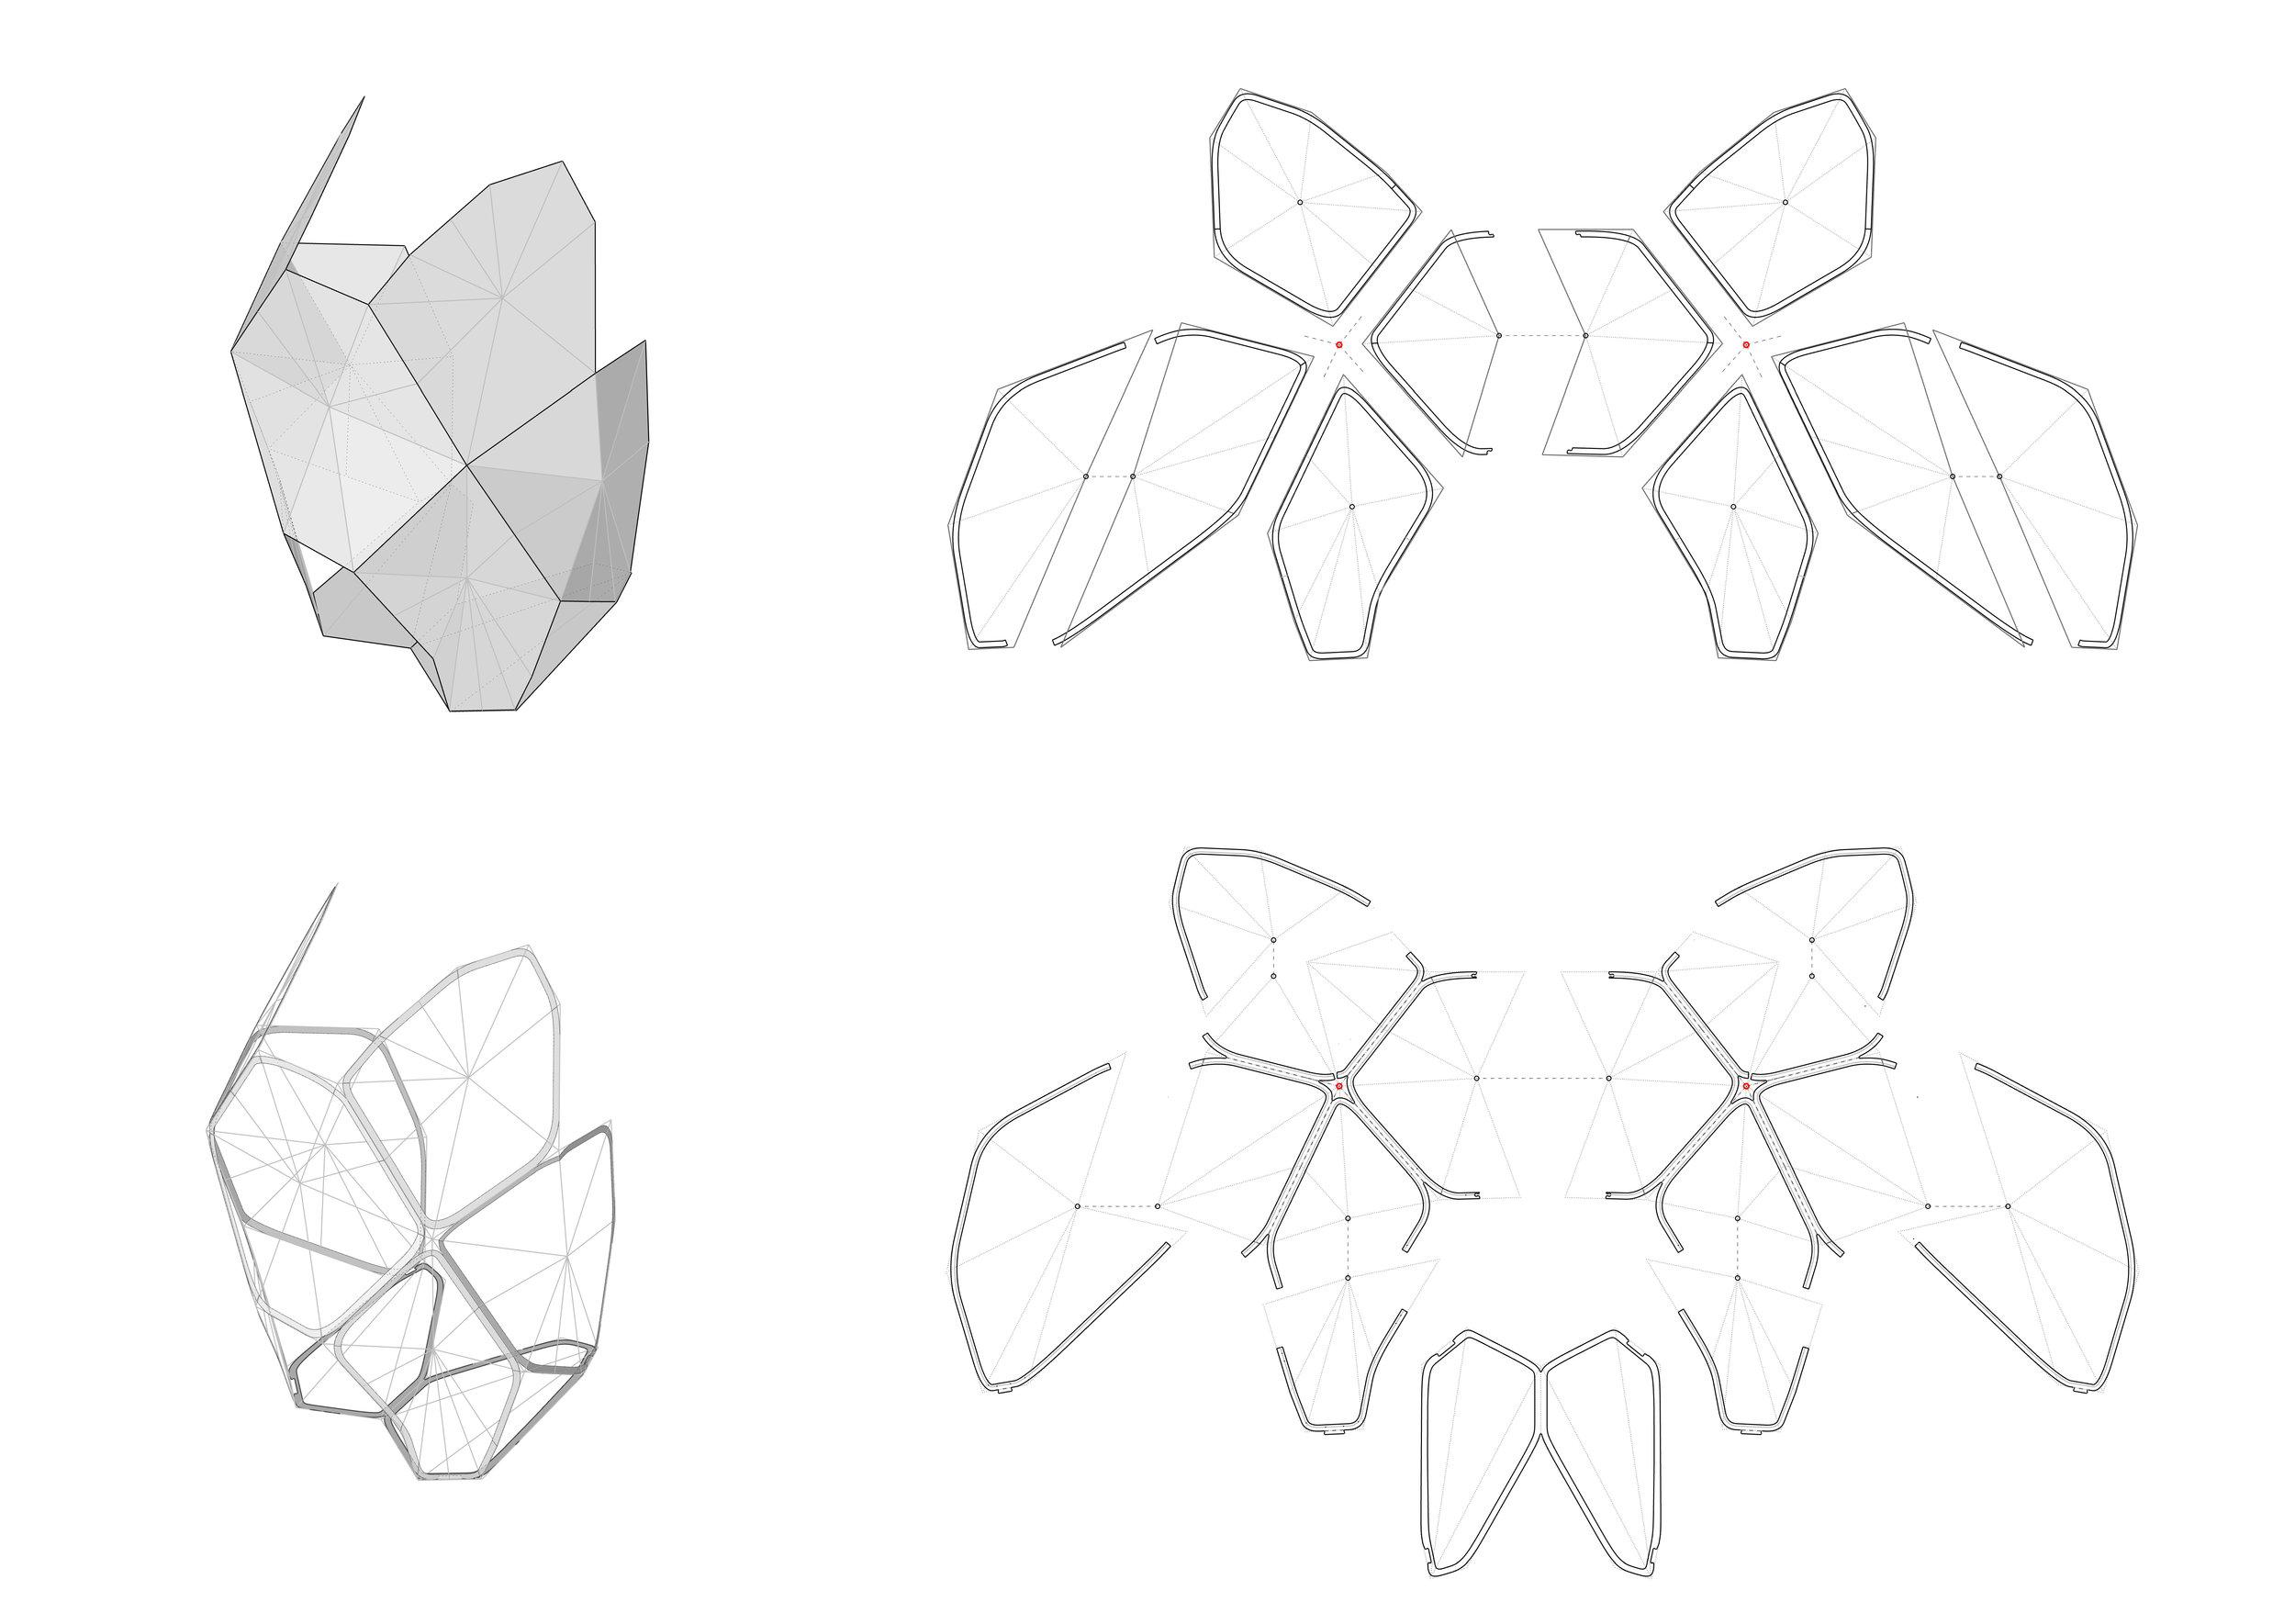 CY drawing 052314_test03.jpg